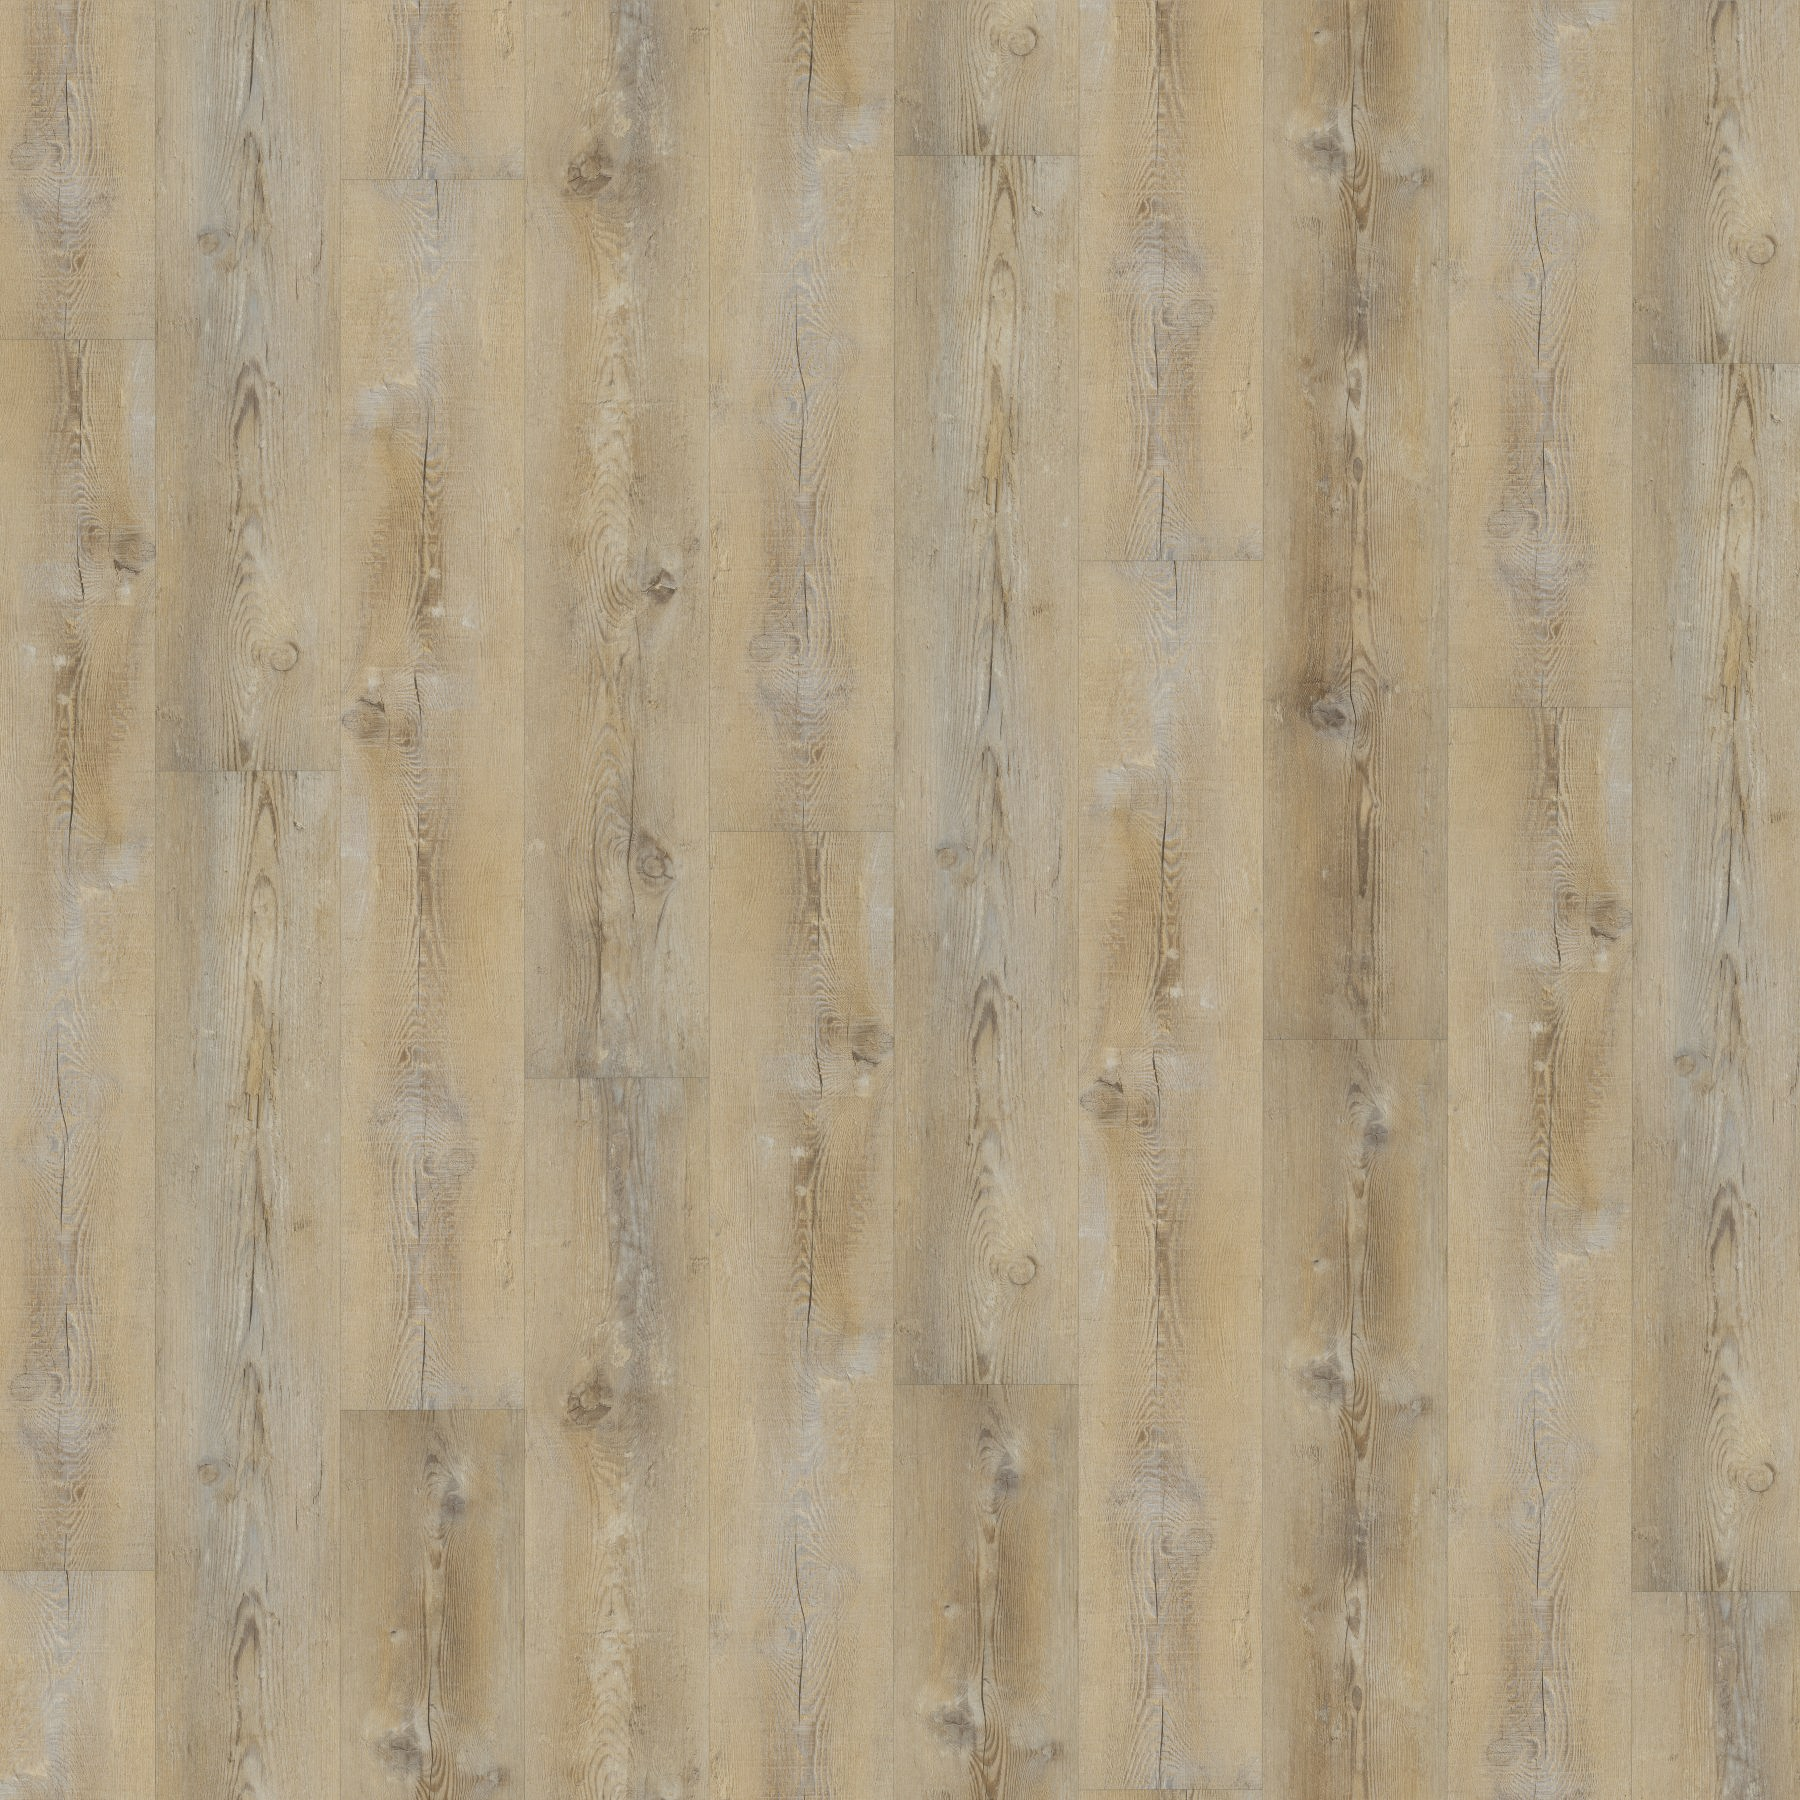 design floor 183 lvt natural pine j4001104 jab anstoetz